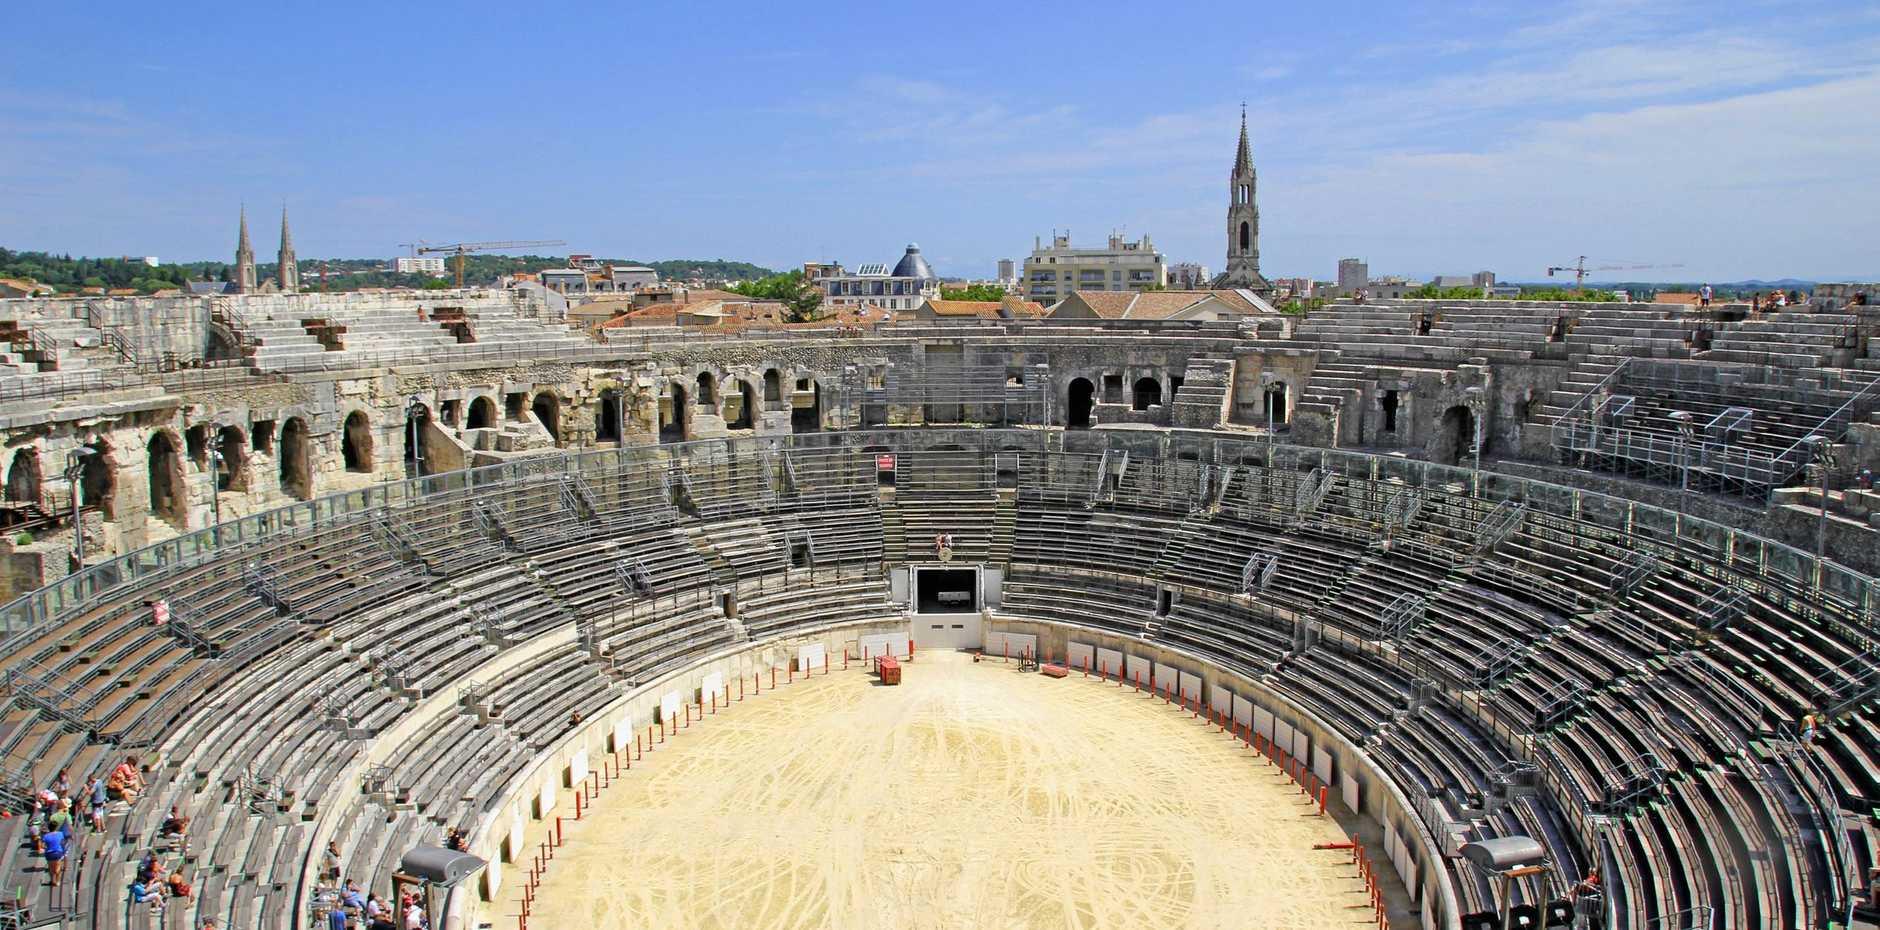 Roman amphitheatre in Nimes, France.